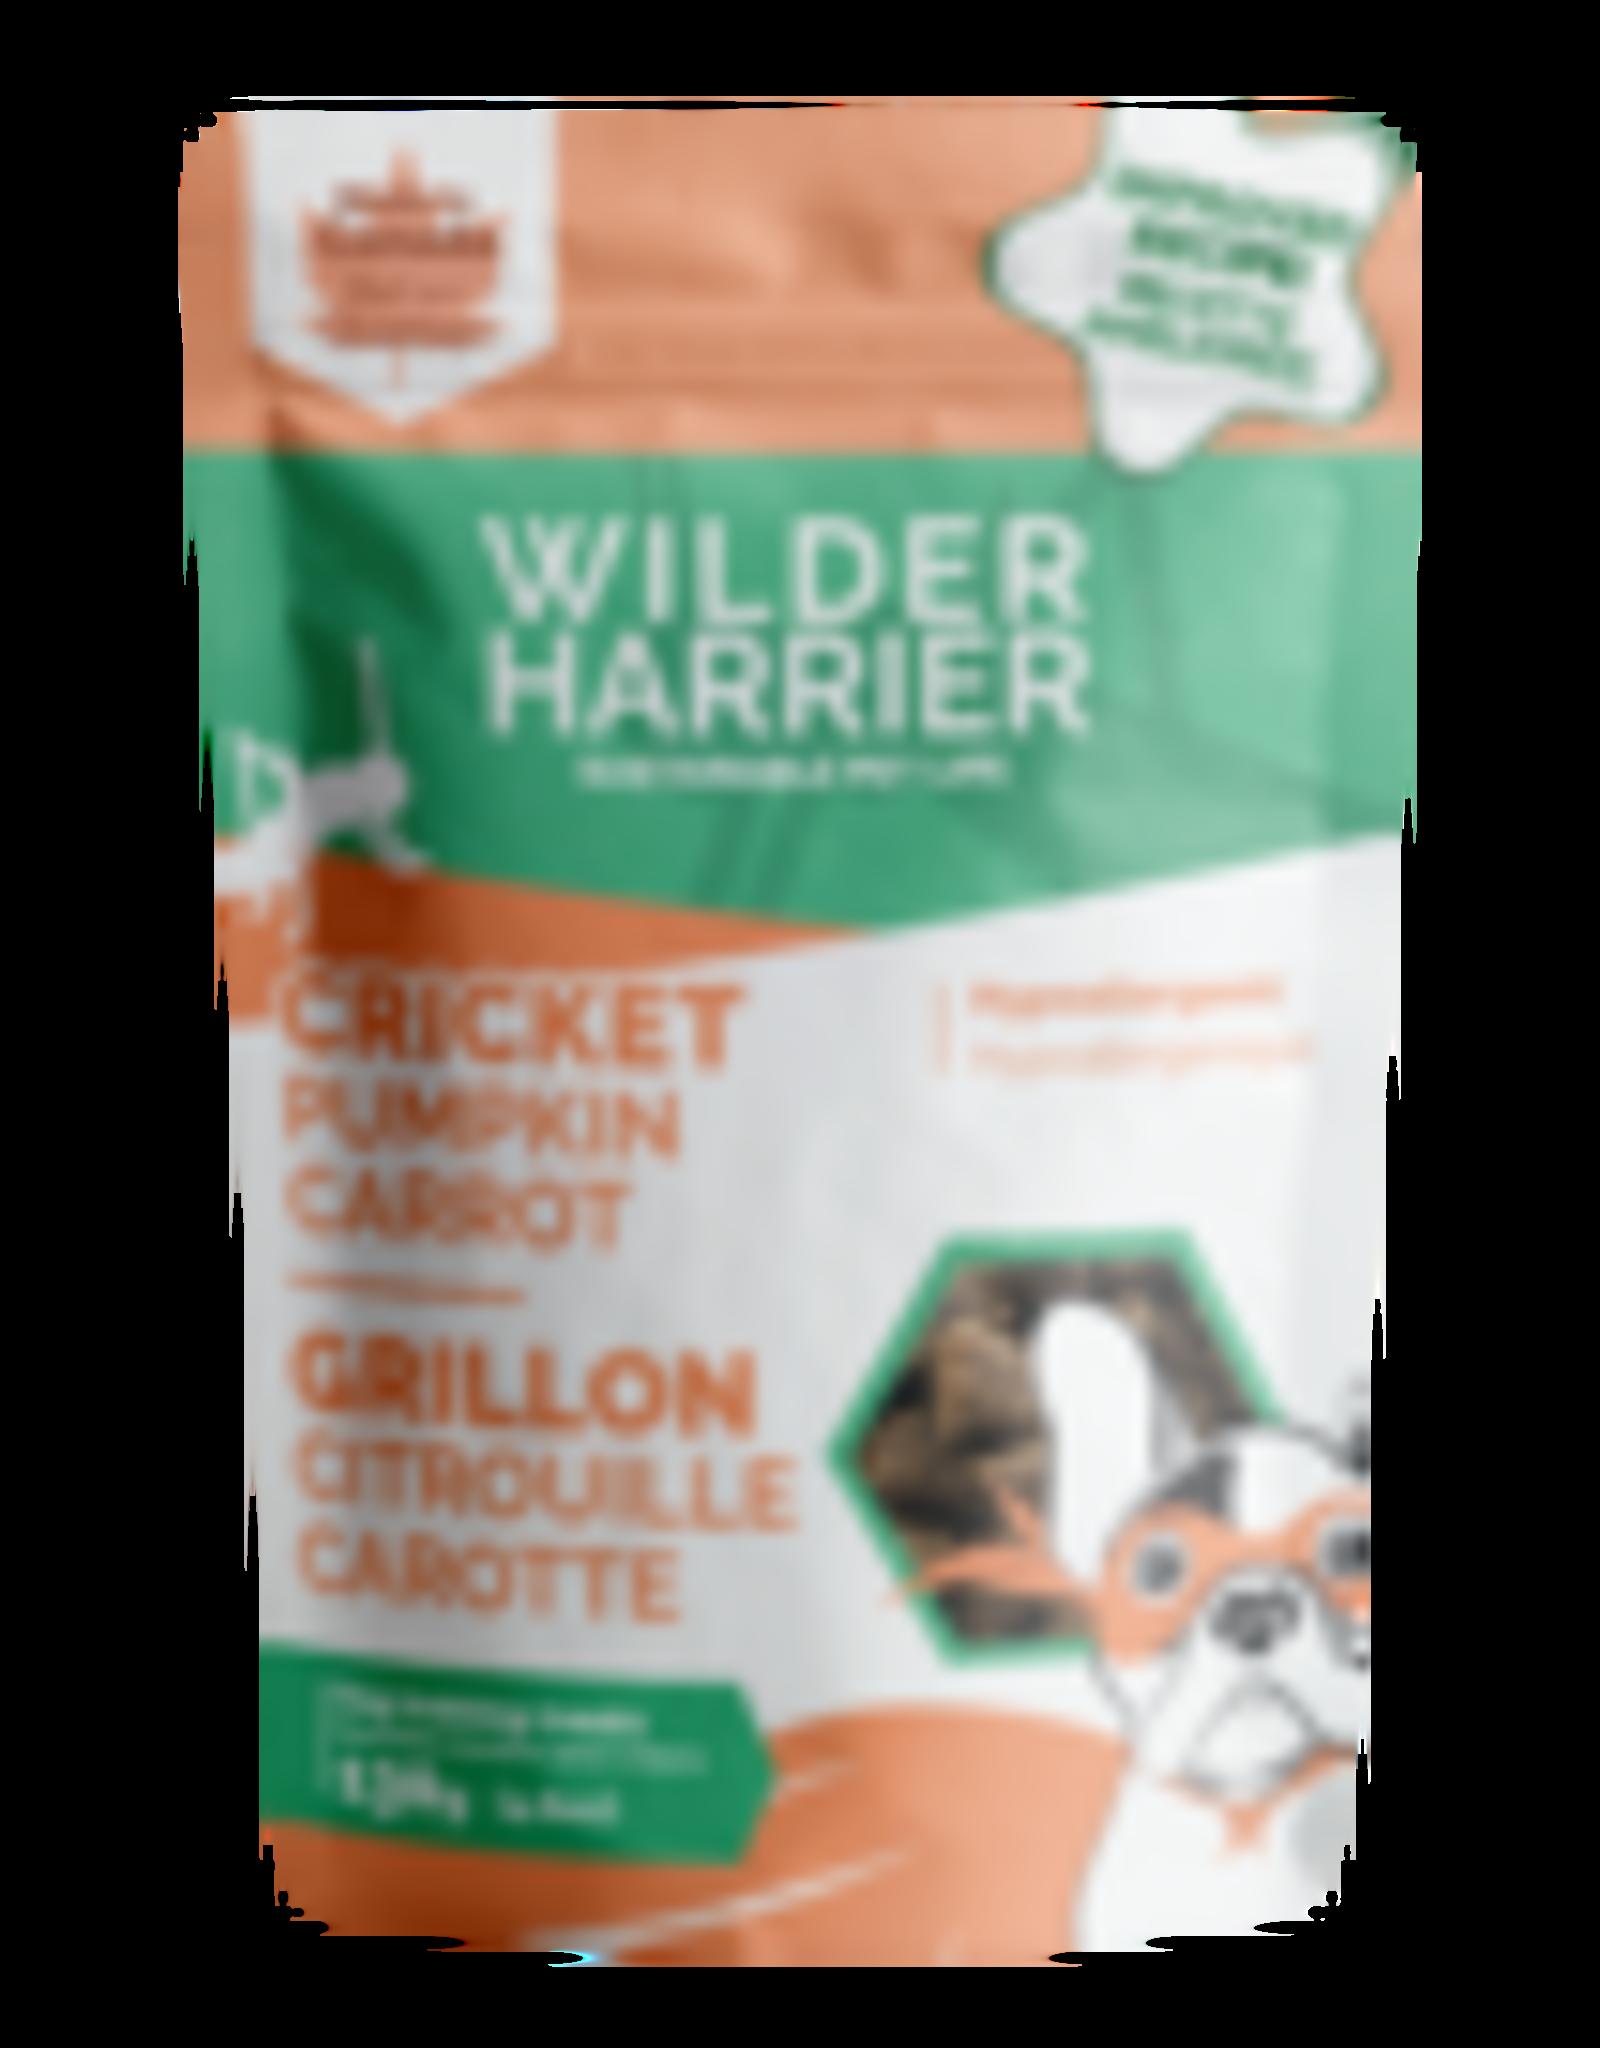 Wilder Harrier Wilder Harrier chien gâteries tendres-grillon, citrouille et carottes 130 gr